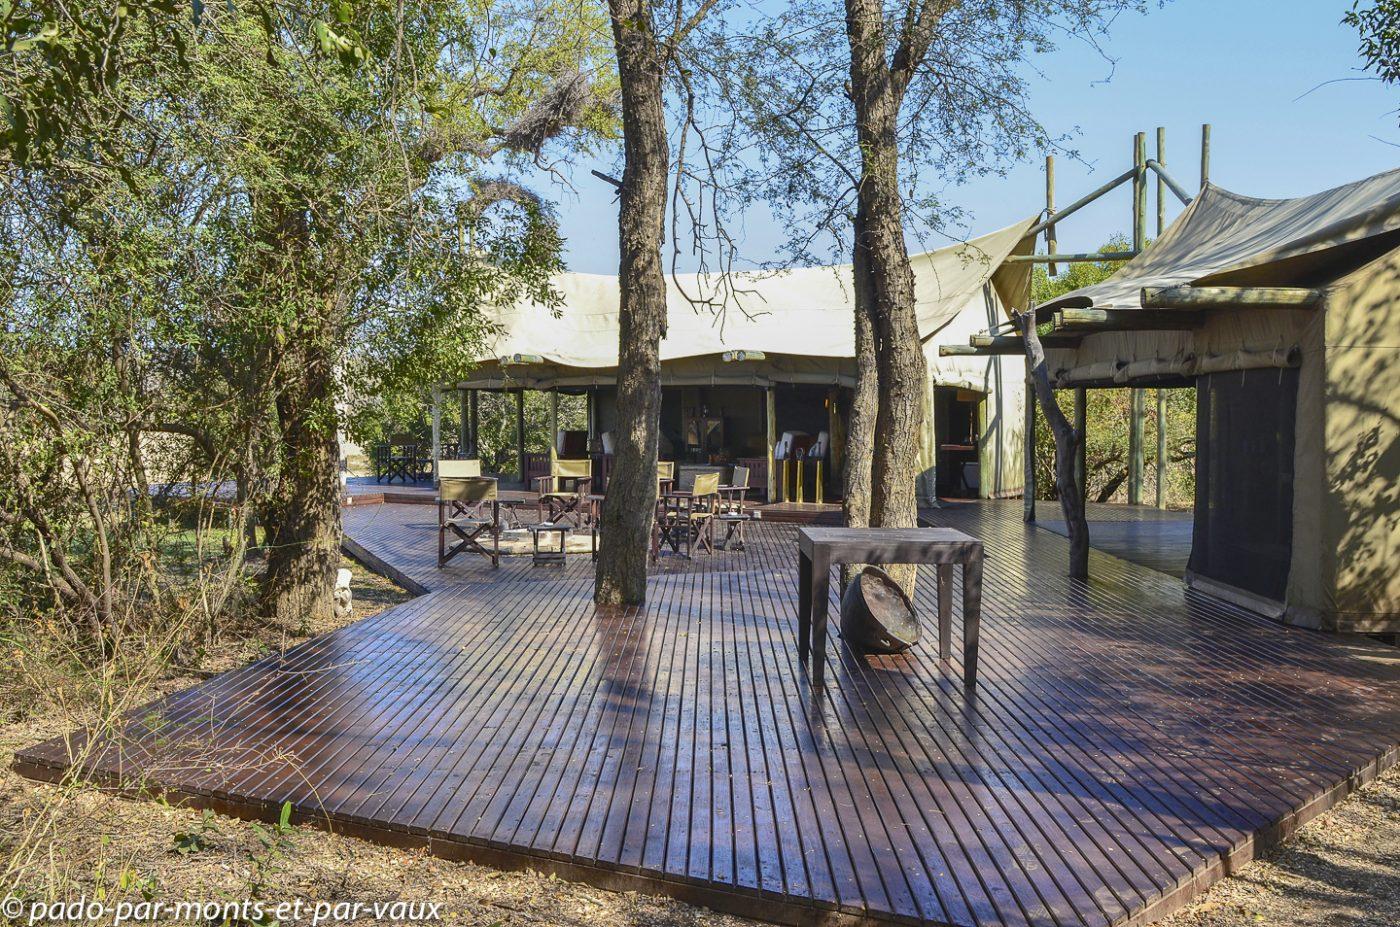 Rhino plains camp